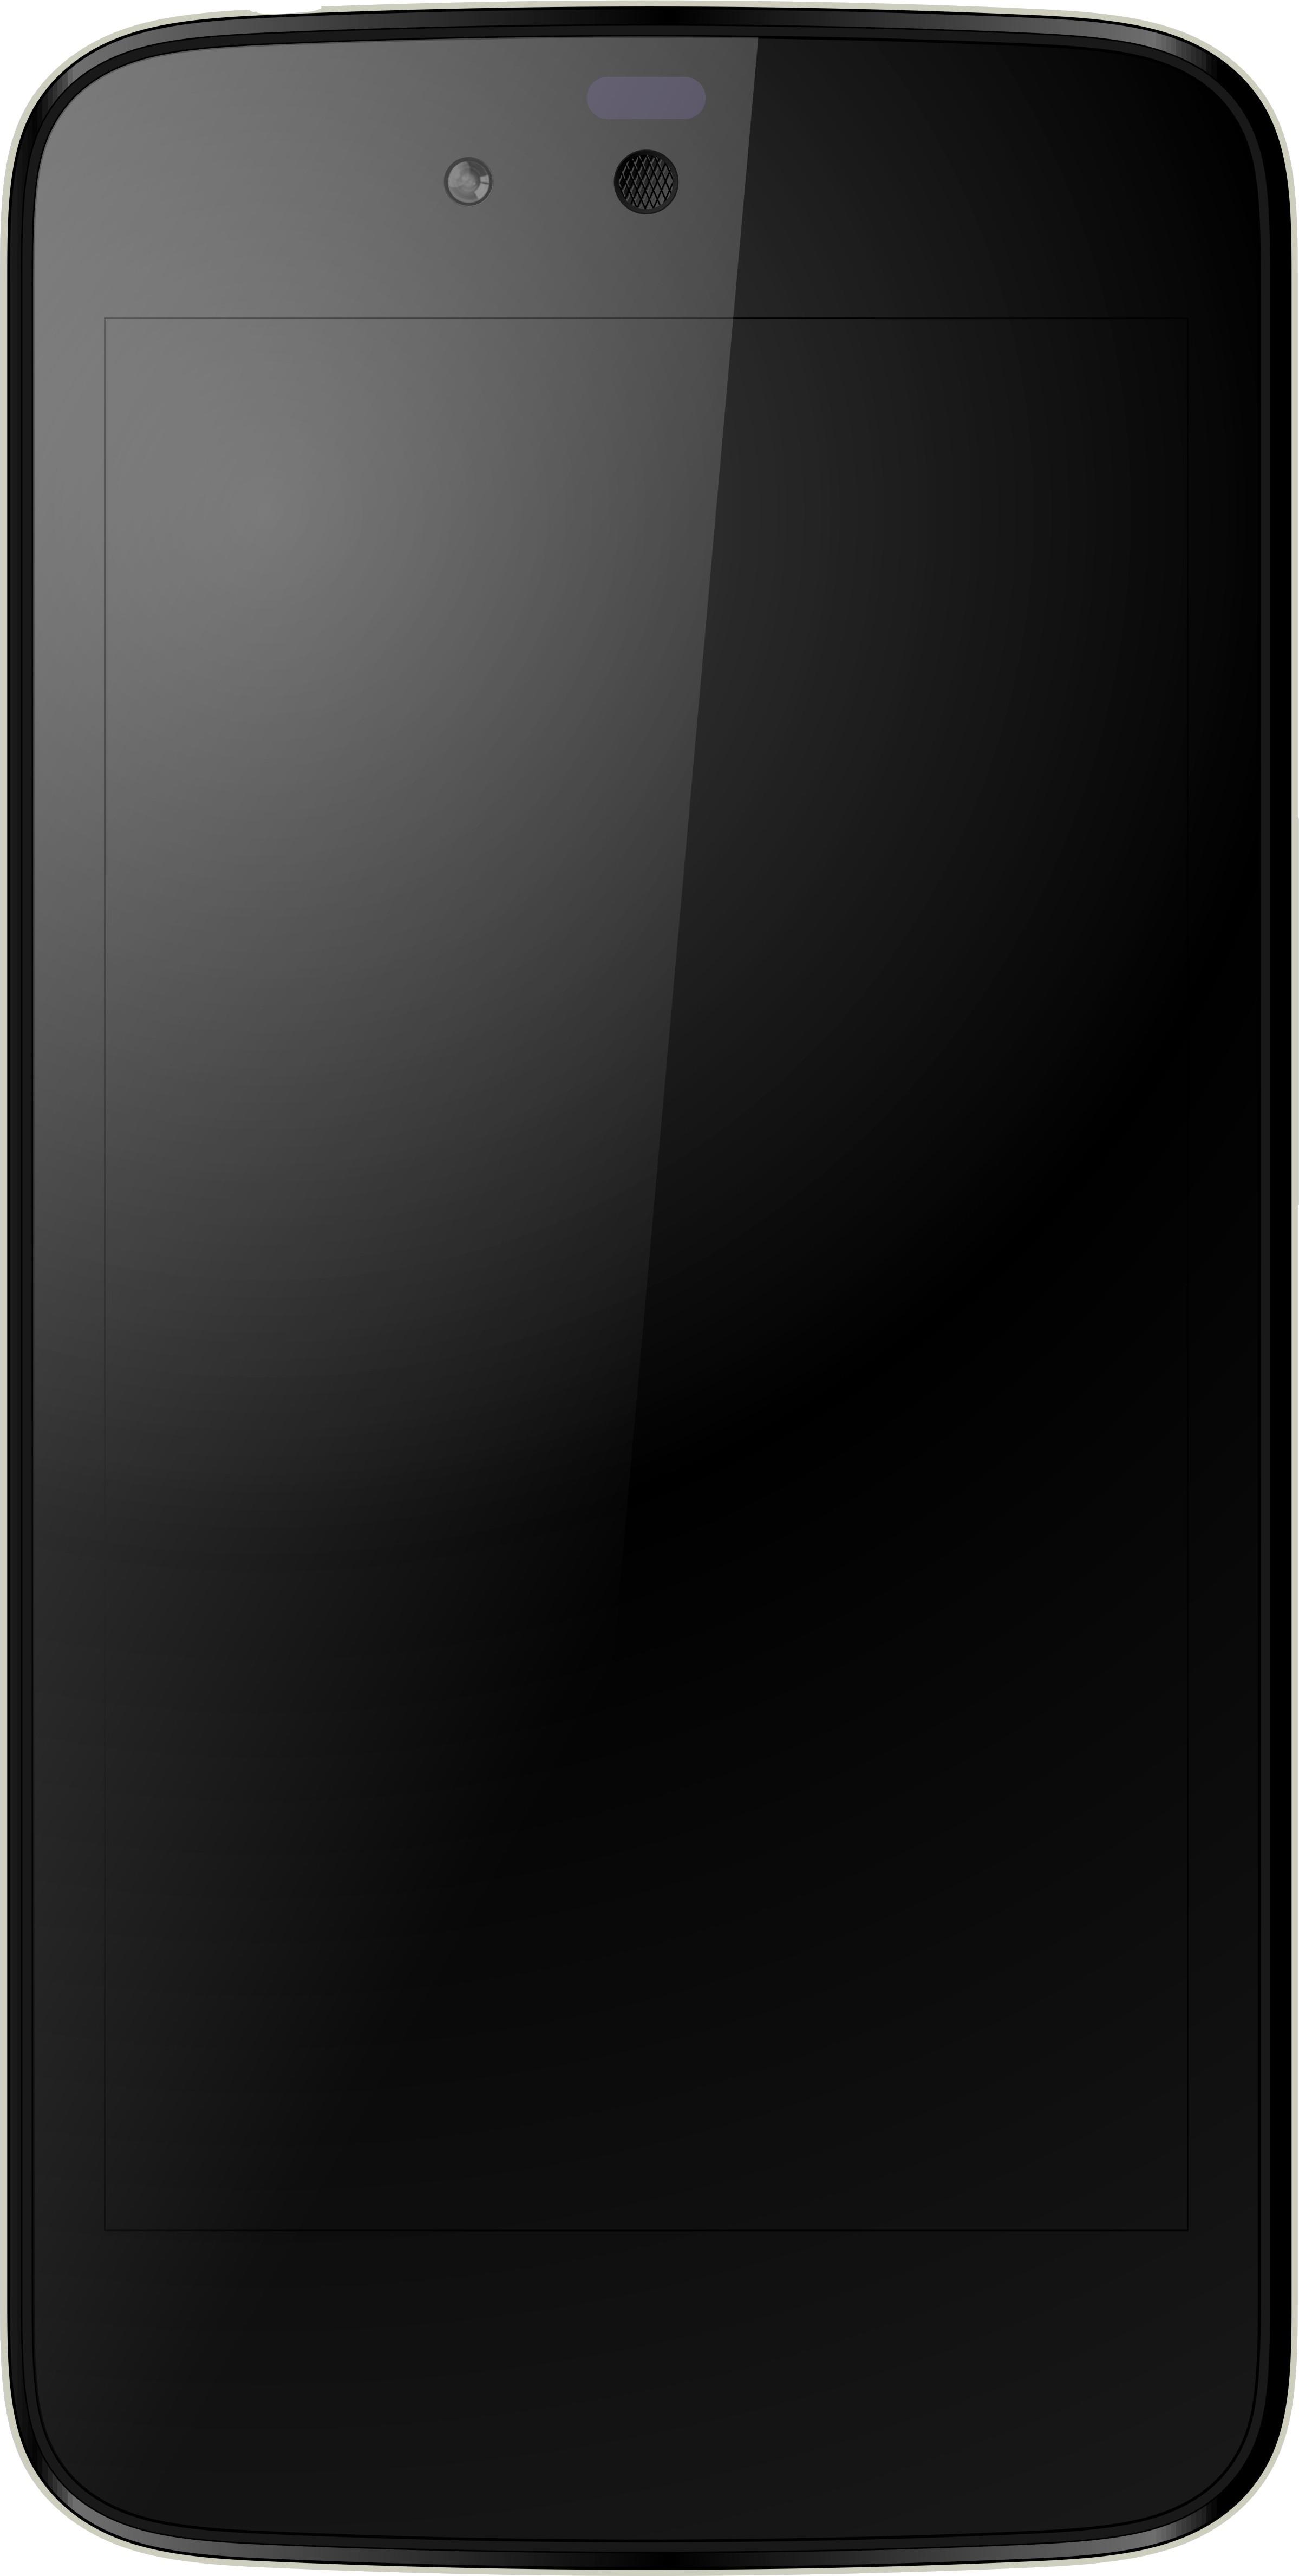 Karbonn Sparkle V (Grey, 4 GB)(1 GB RAM)